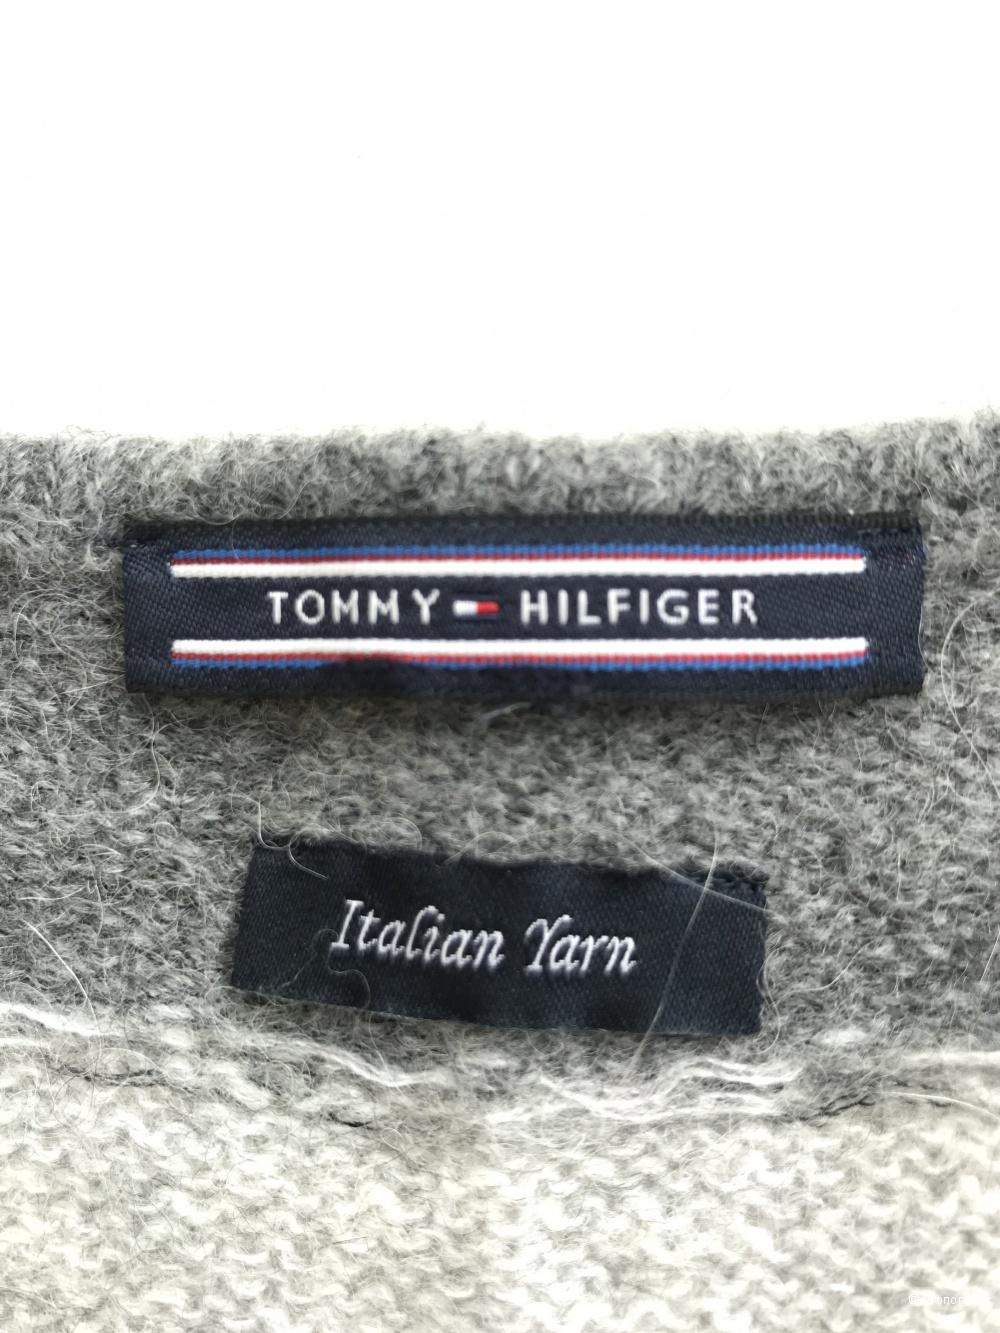 Свитер Tommy Hilfiger 44 размер